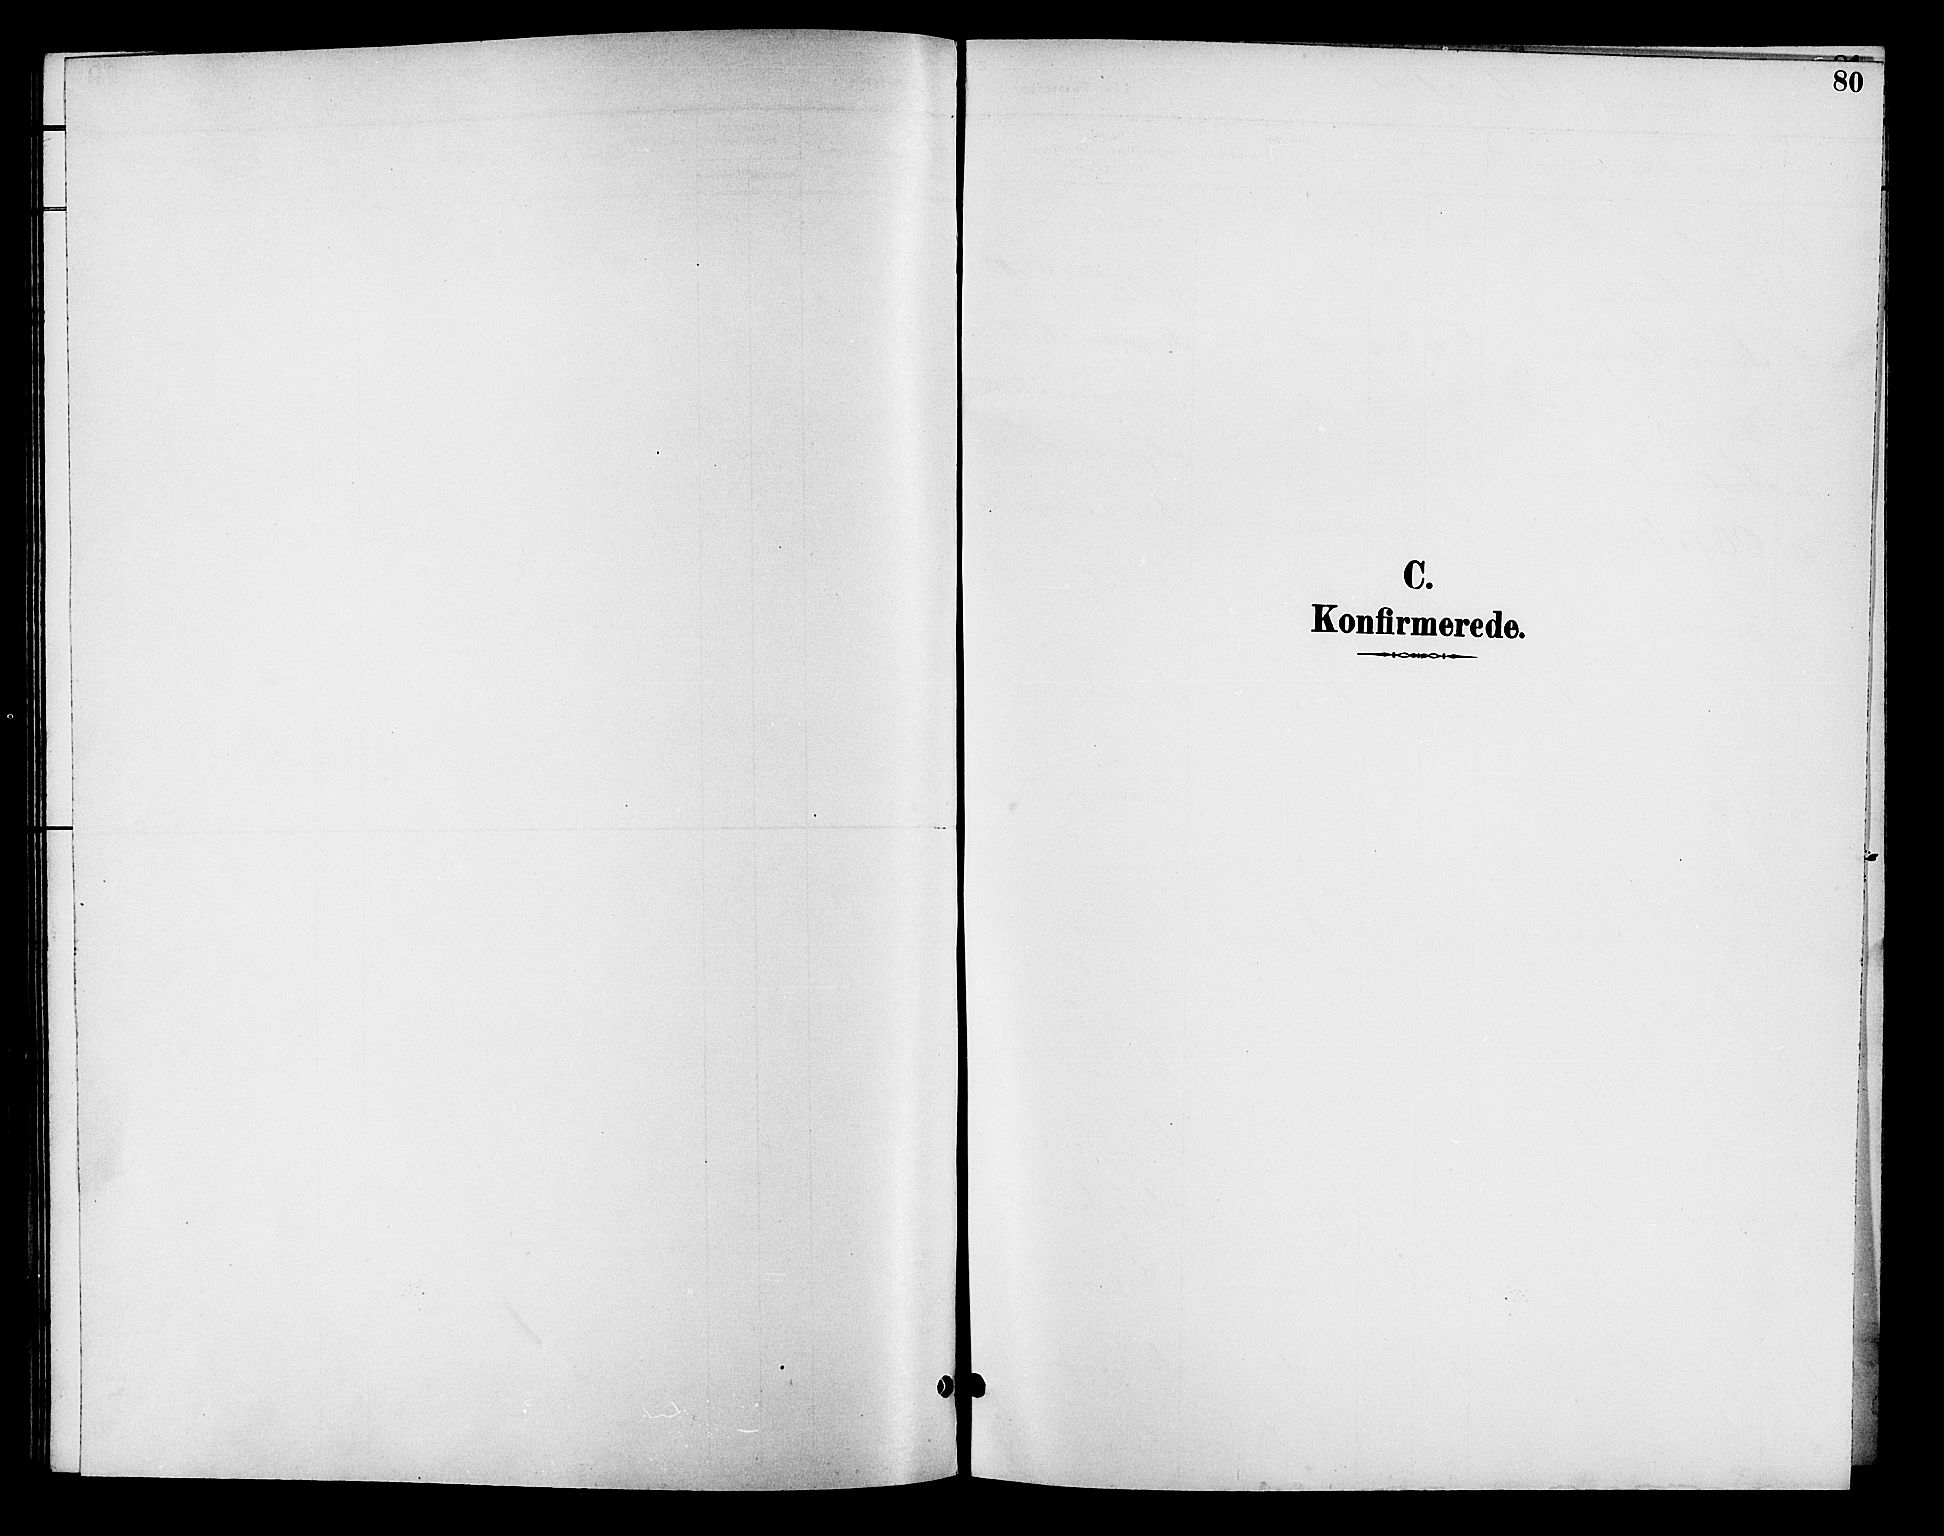 SAH, Fåberg prestekontor, H/Ha/Hab/L0008: Klokkerbok nr. 8, 1891-1900, s. 80